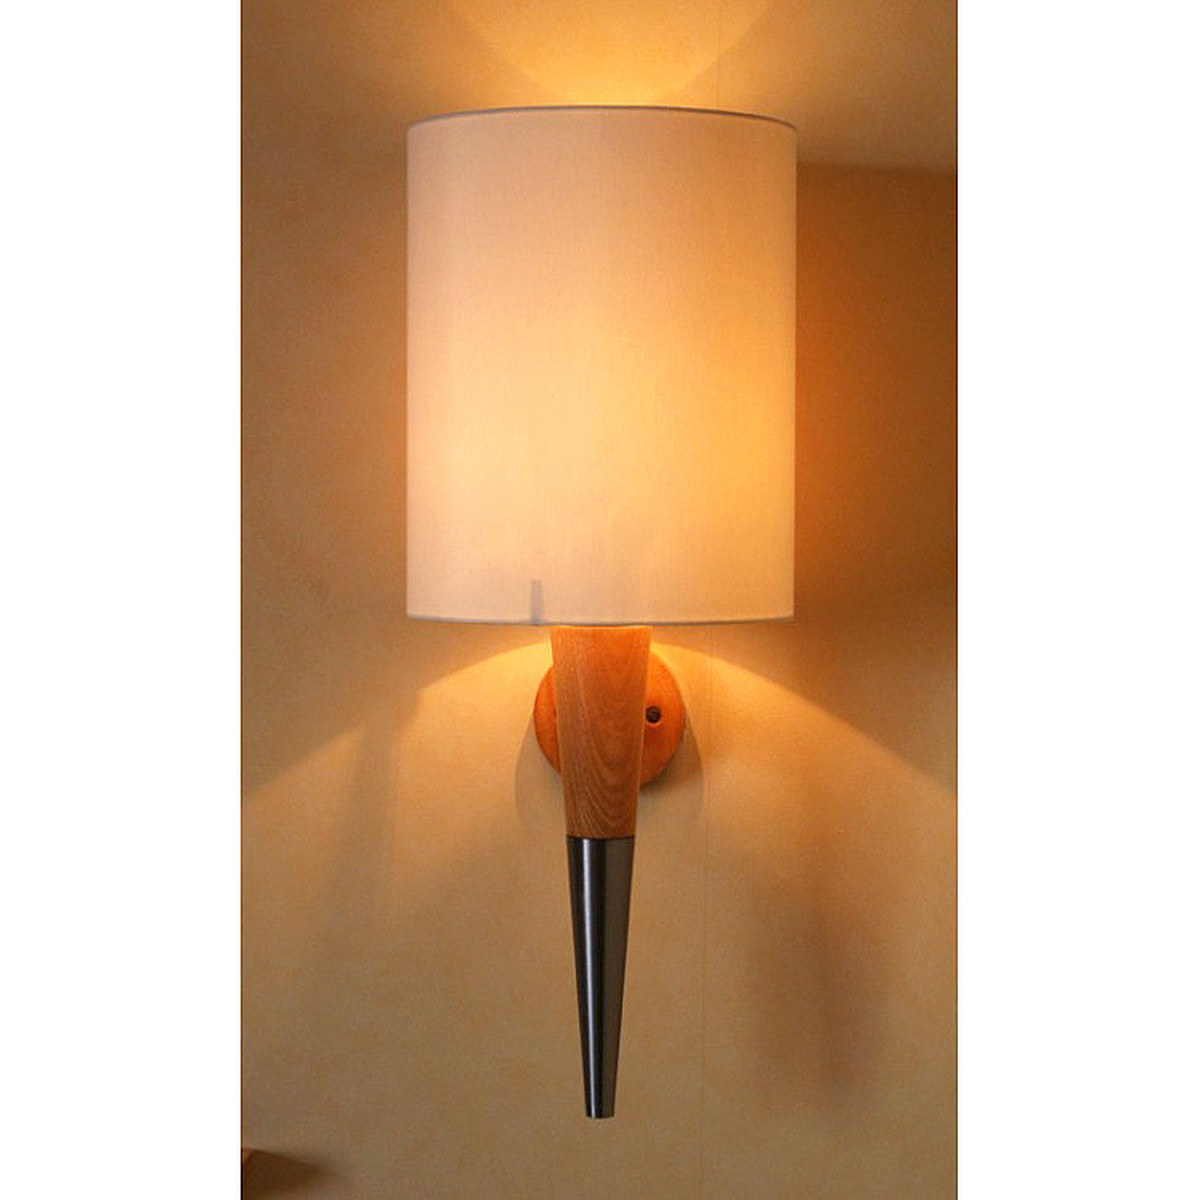 quality wall mounted lights mf1919 peterborough cambridgeshire